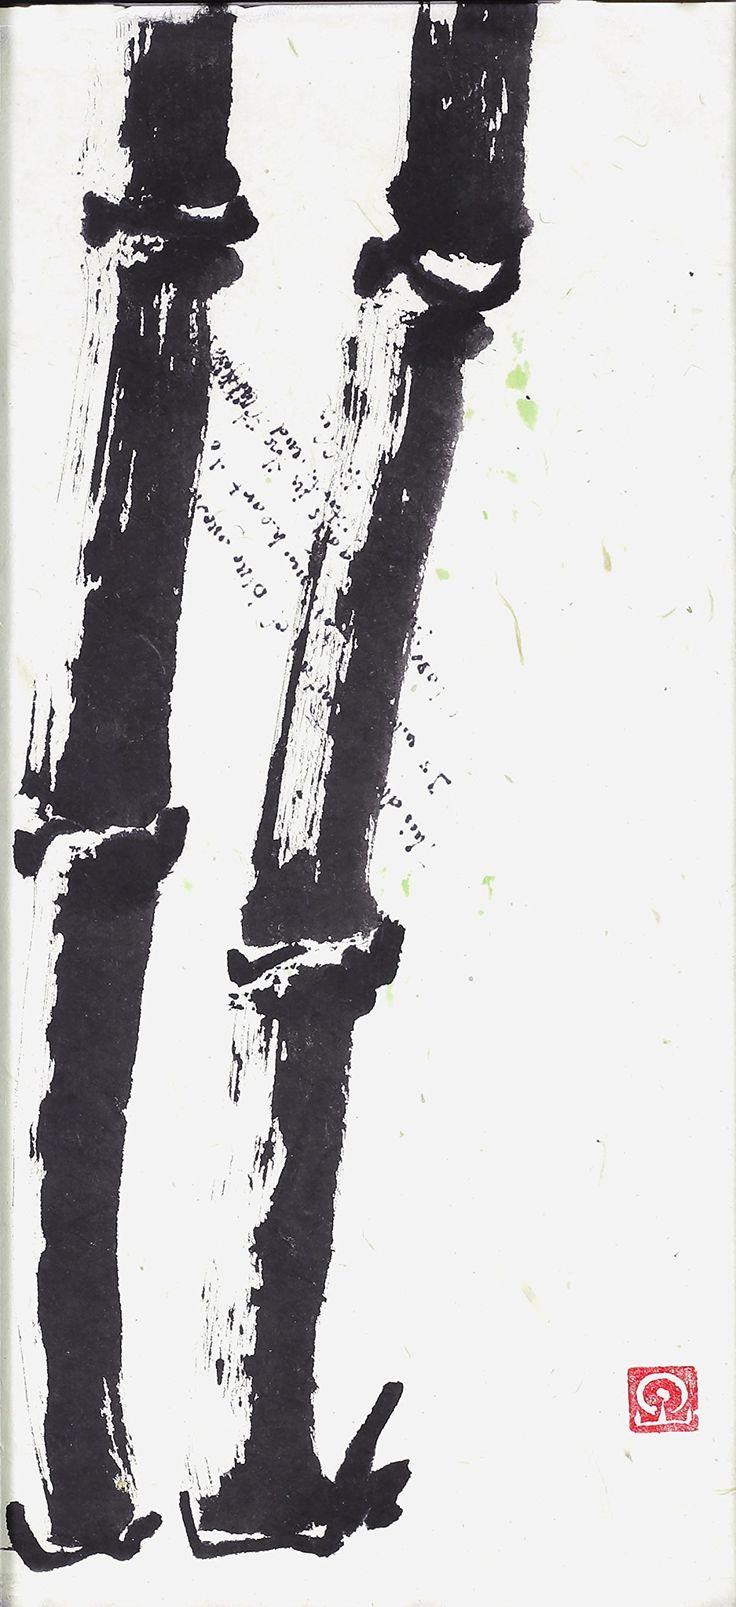 Zen Brush: Urban bamboo. This is a archival giclee print of an original zen brushwork piece.